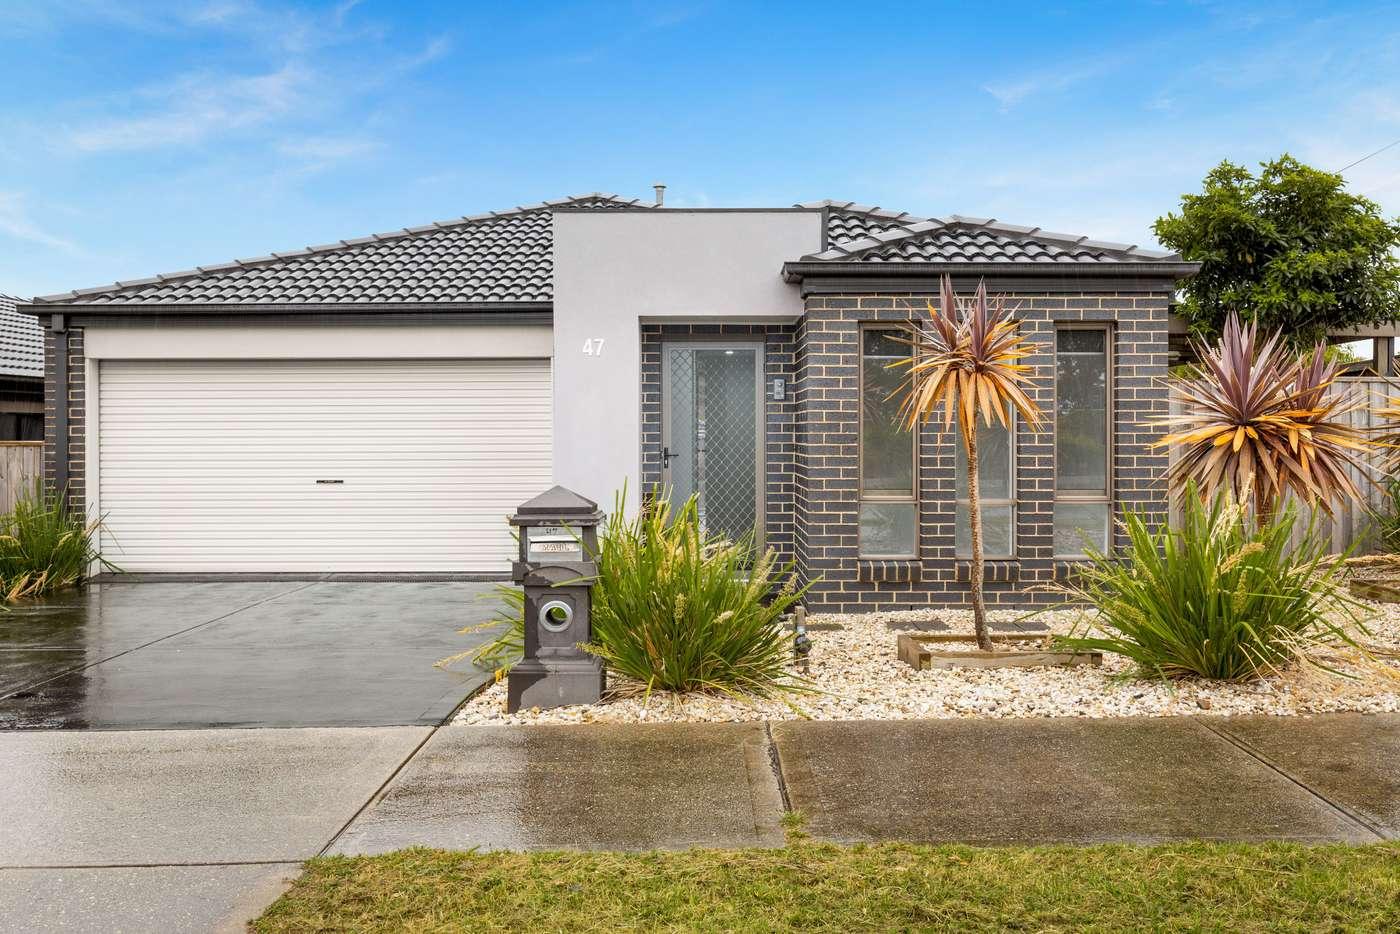 Main view of Homely house listing, 47 Rockford Street, Pakenham VIC 3810